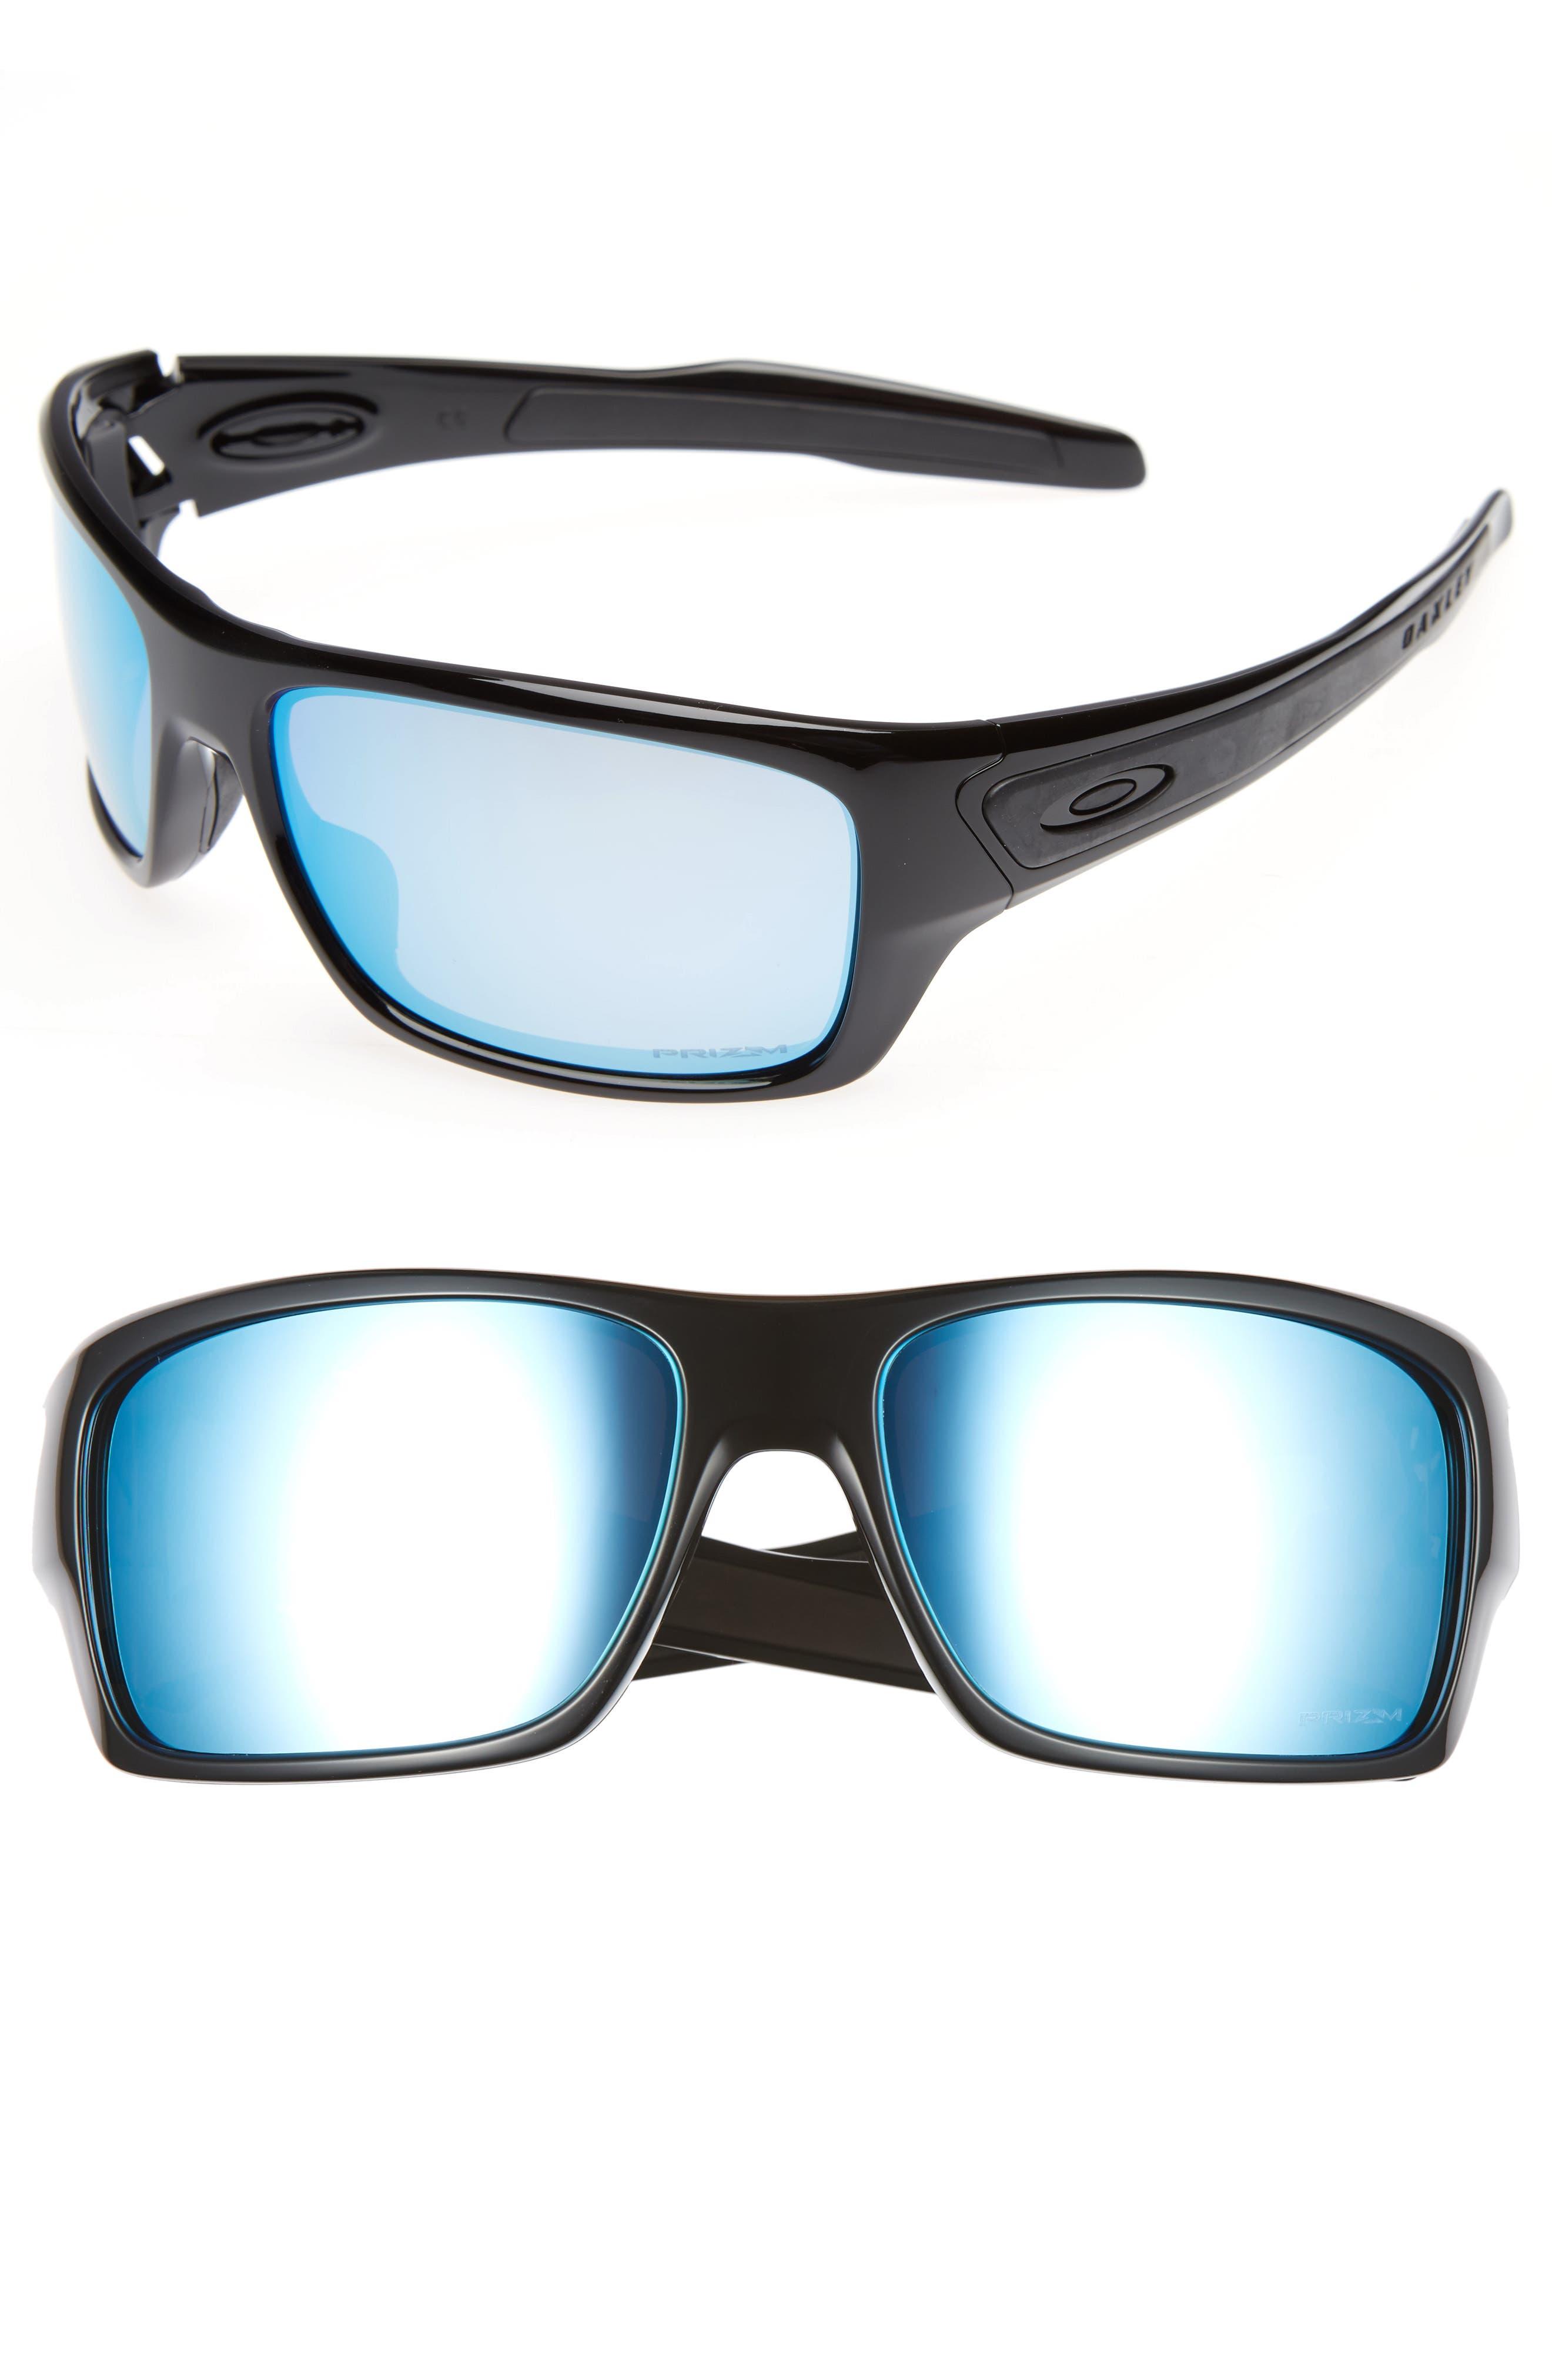 Oakley Turbine H2O 65mm Polarized Sunglasses